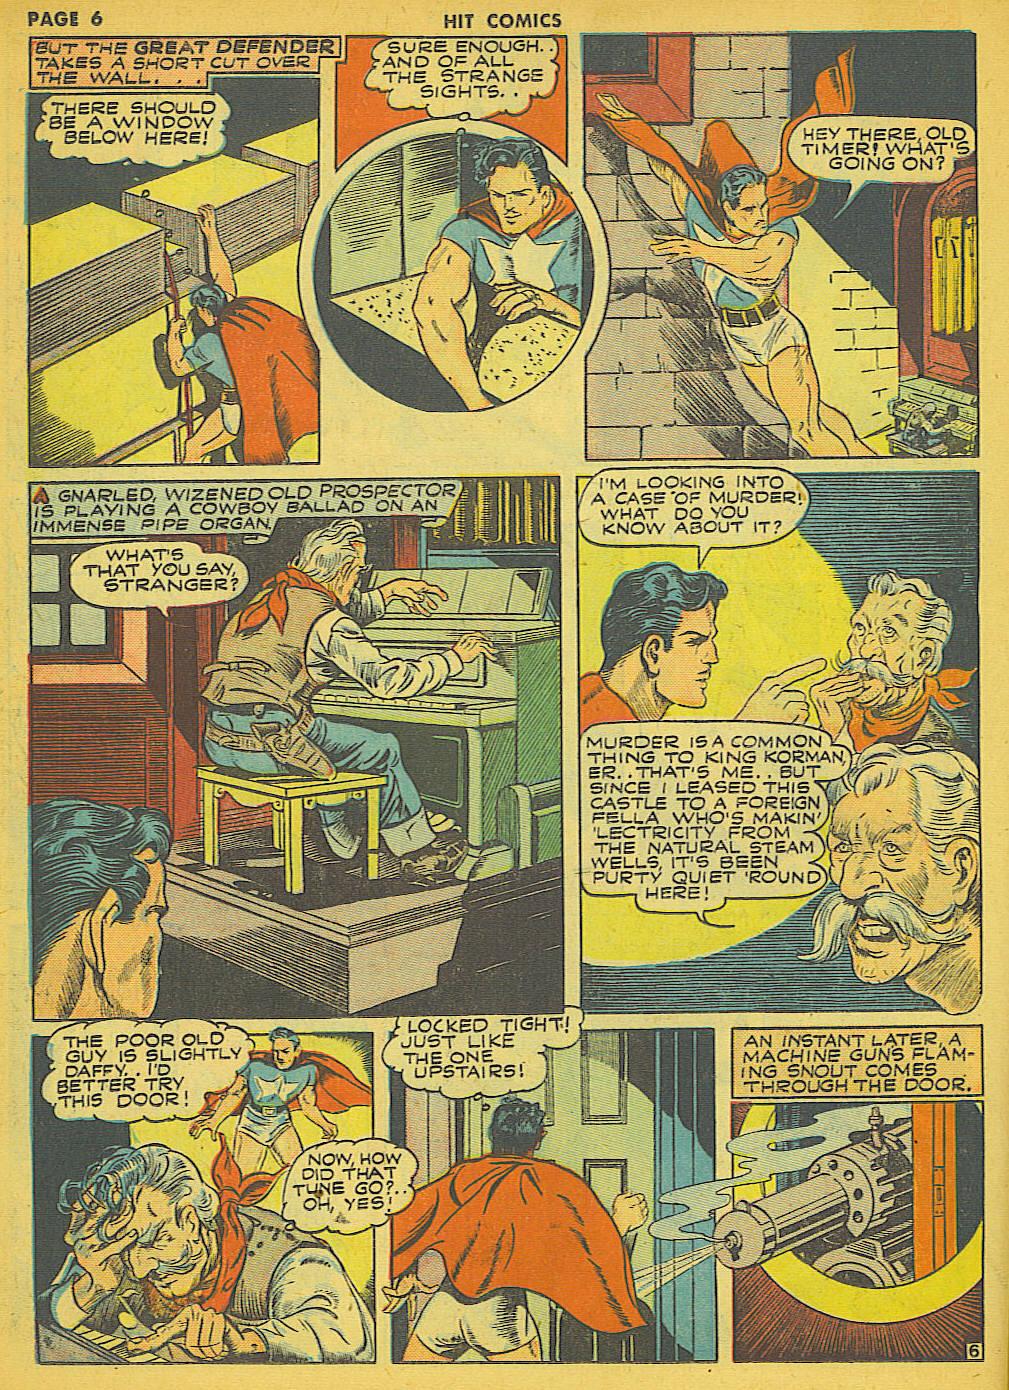 Read online Hit Comics comic -  Issue #21 - 8